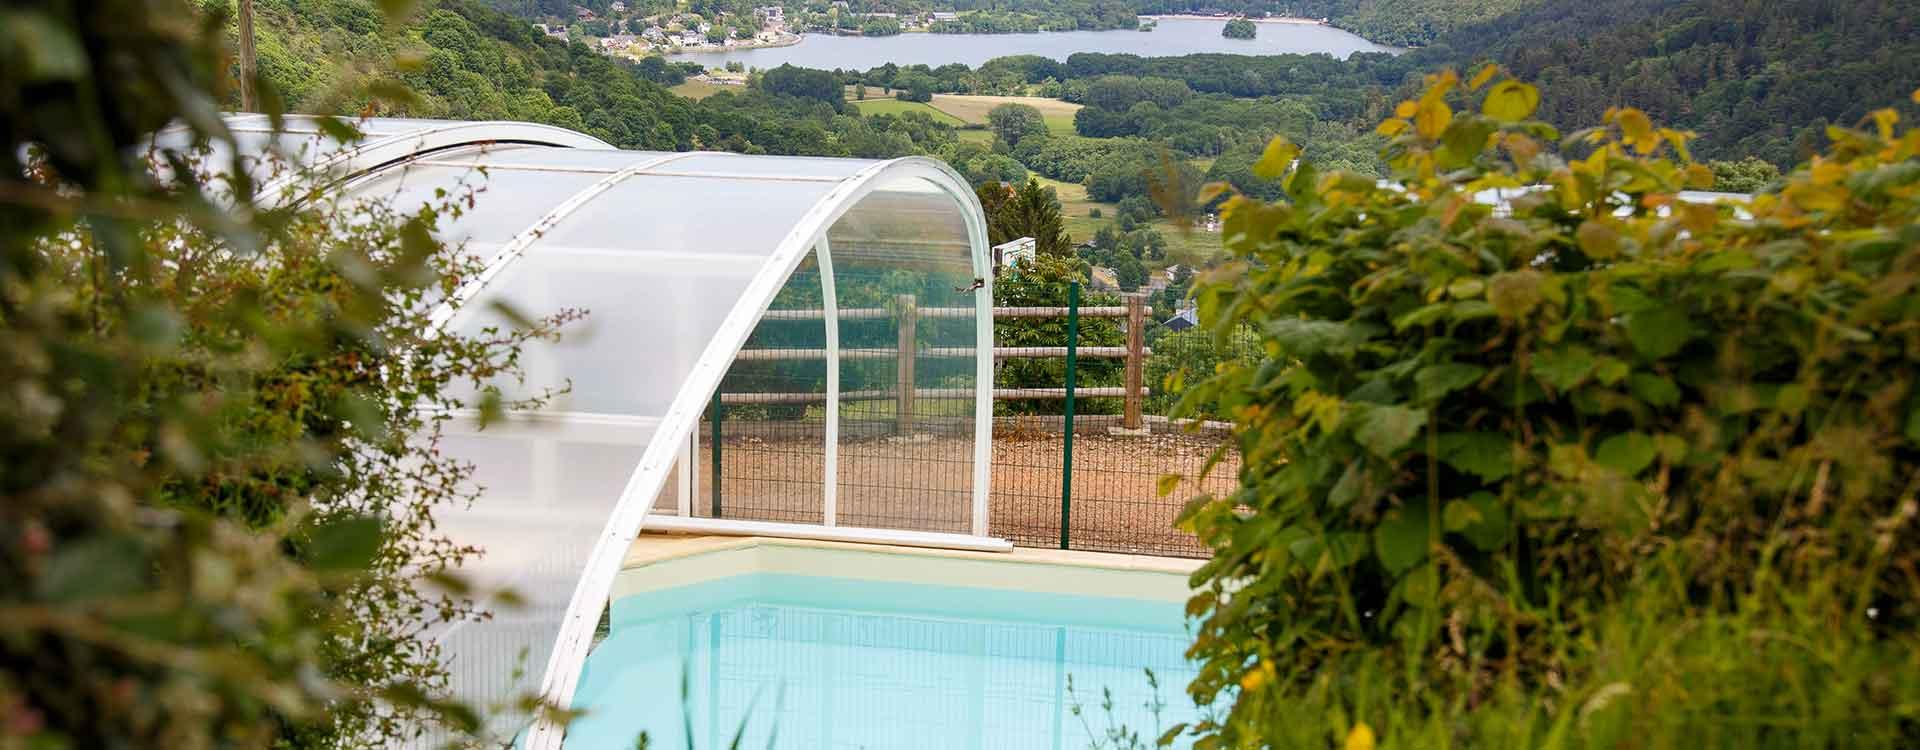 piscine du camping en Auvergne